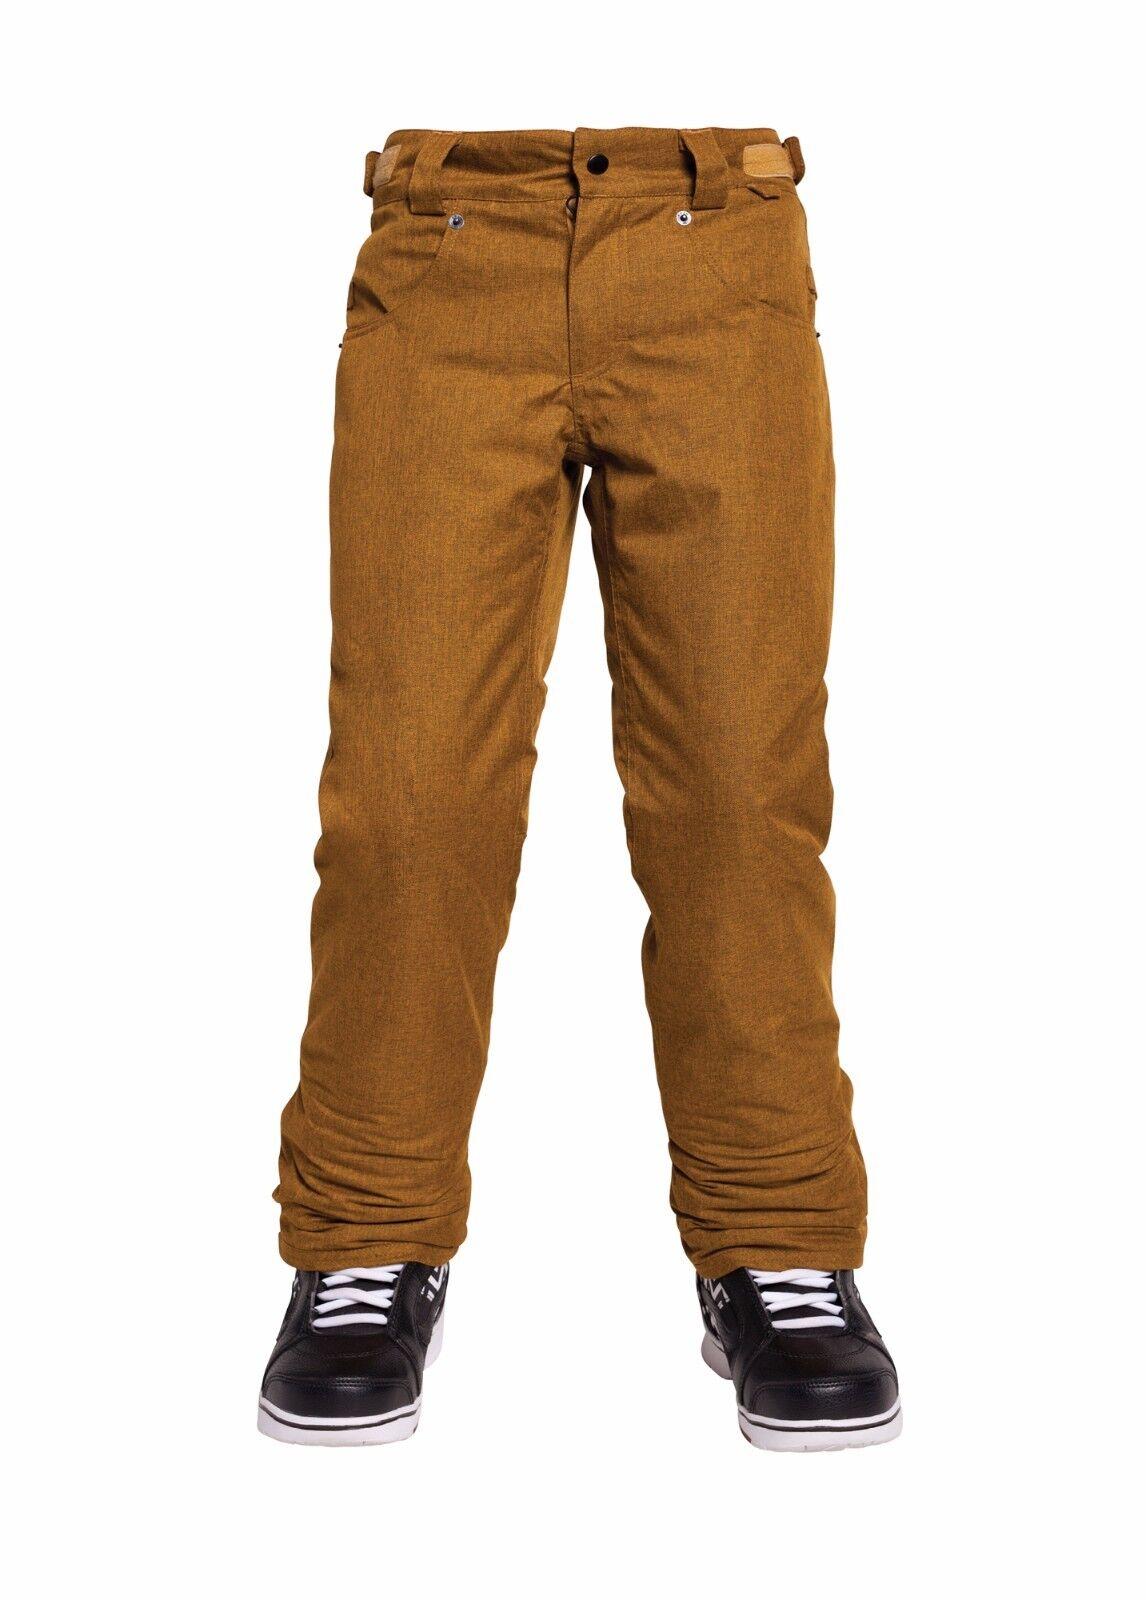 2017 NWT 686 Prospect Pant Pants Boys Youth Kids Snowboard M Medium 15K ay25